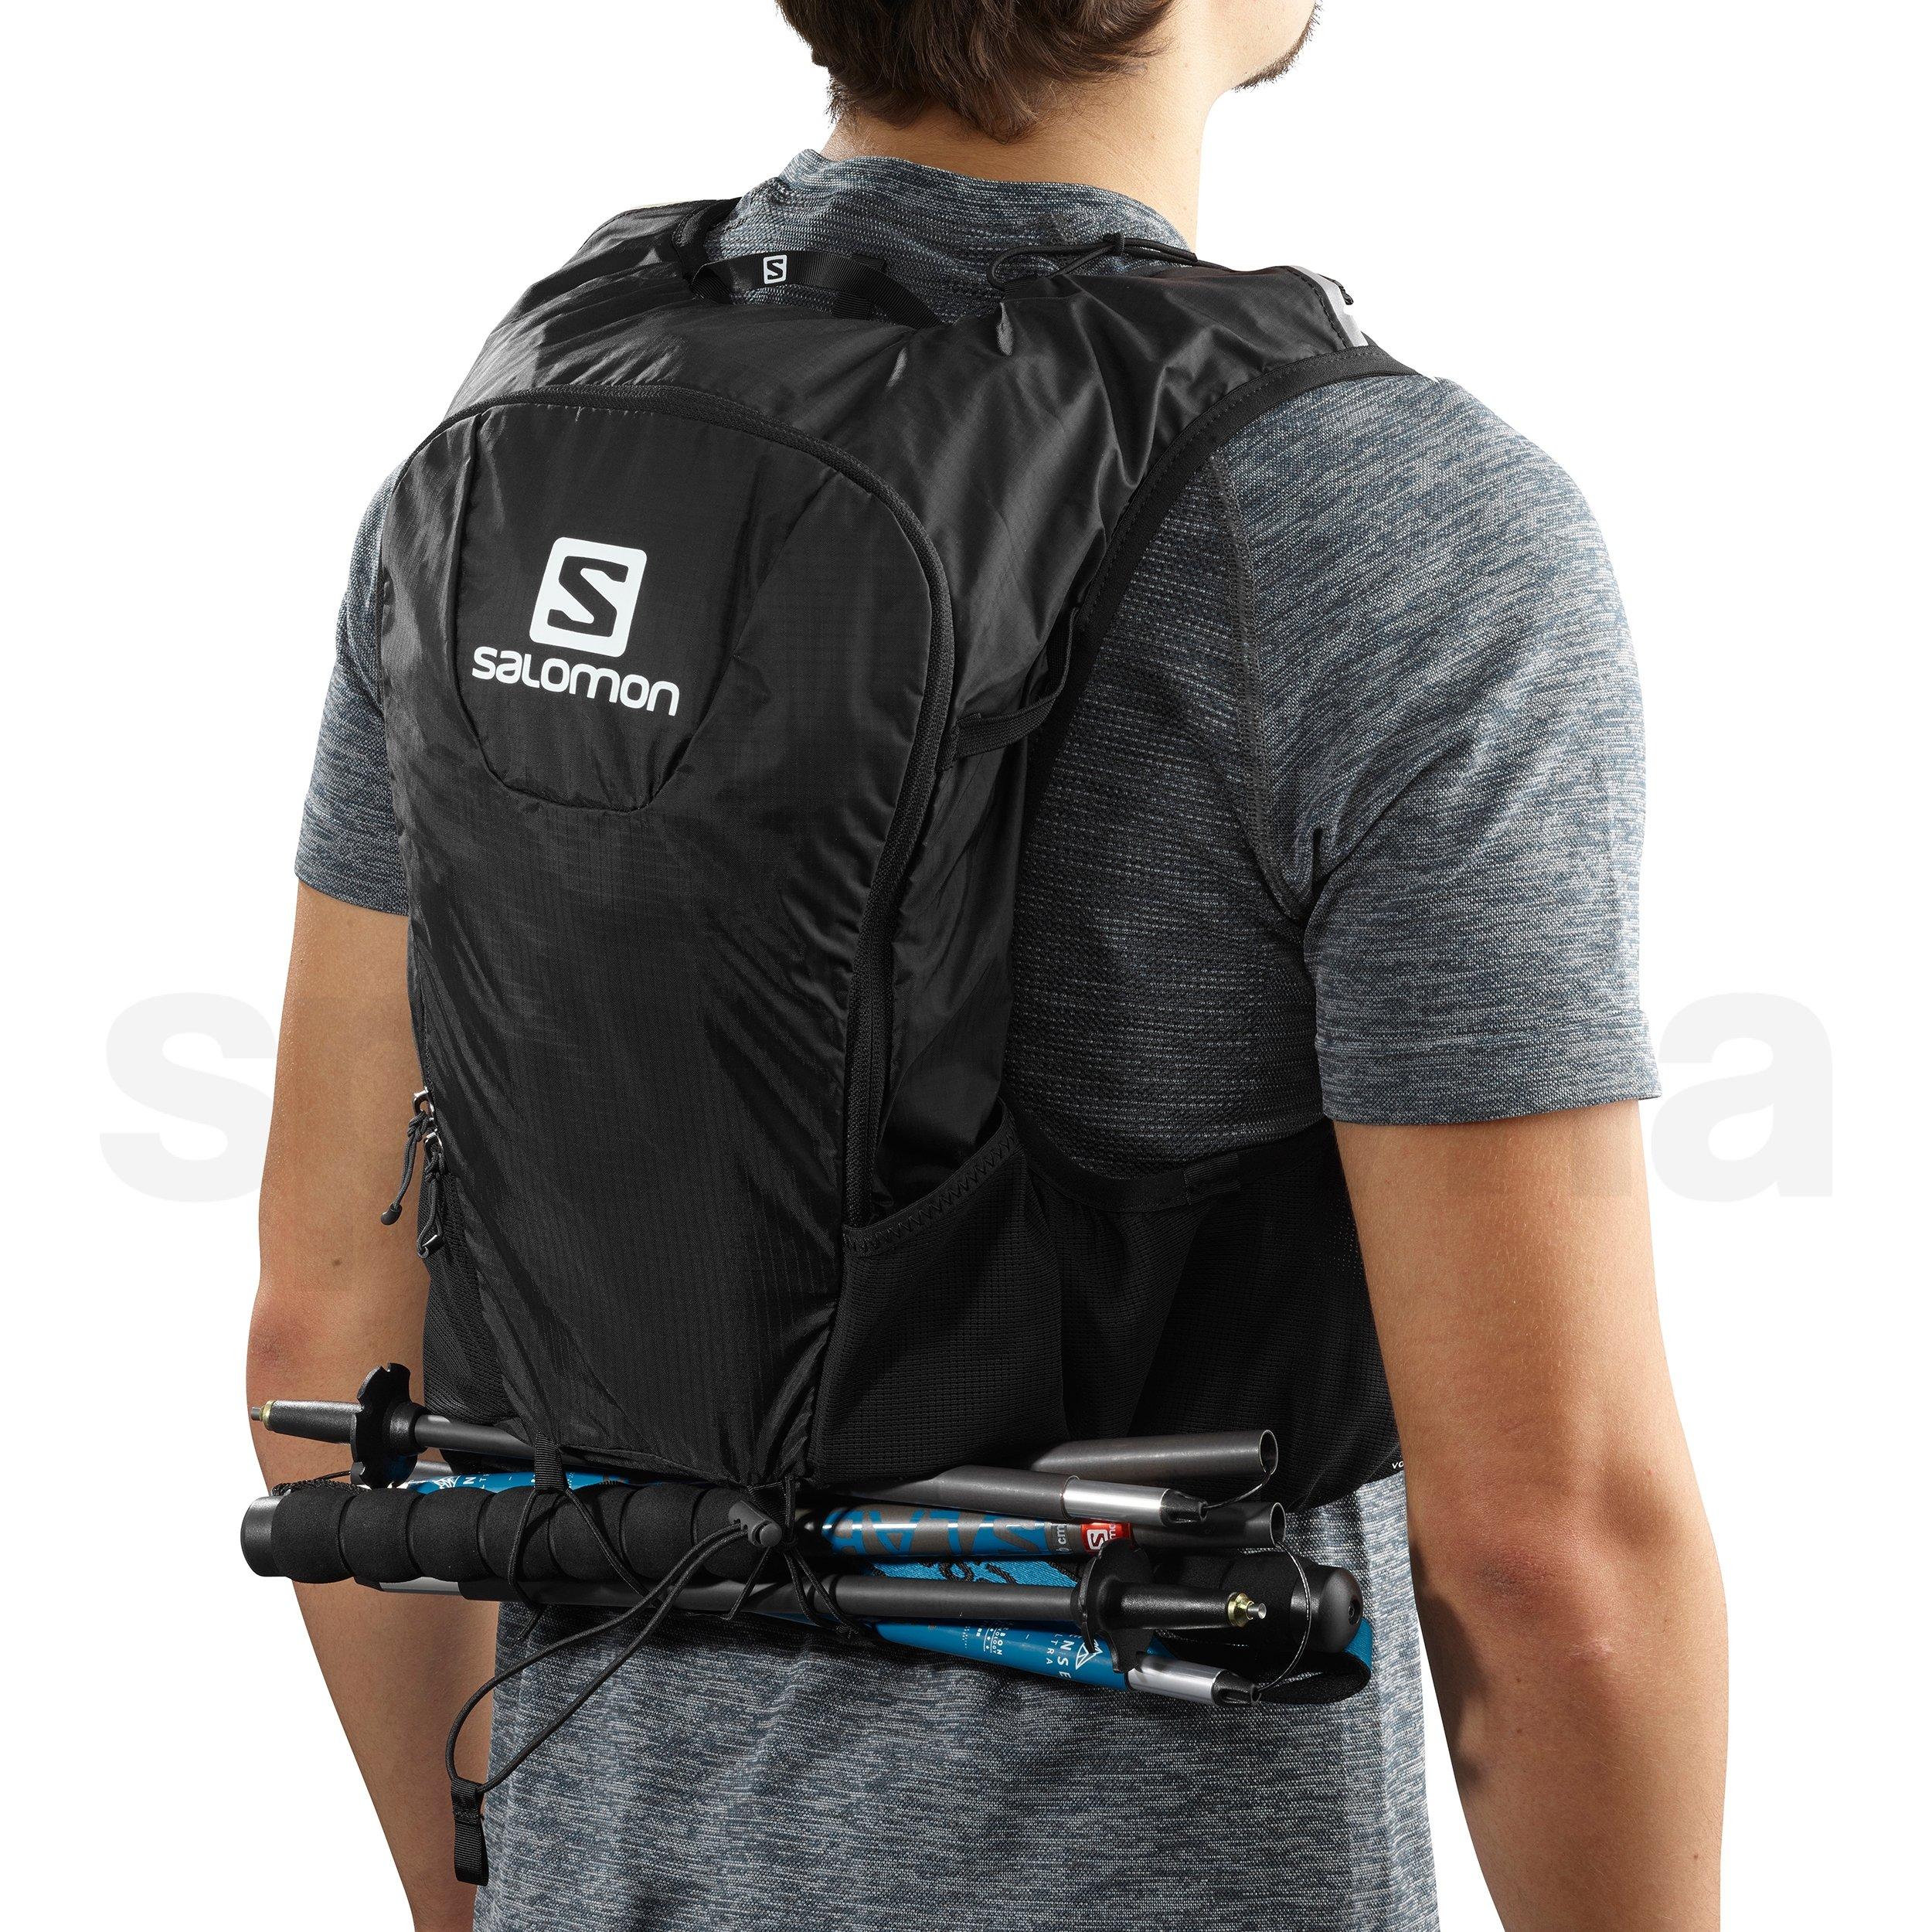 221c67f926 Sportovní batoh Salomon SKIN PRO 10 SET Black - LC1092300 - Sportovna